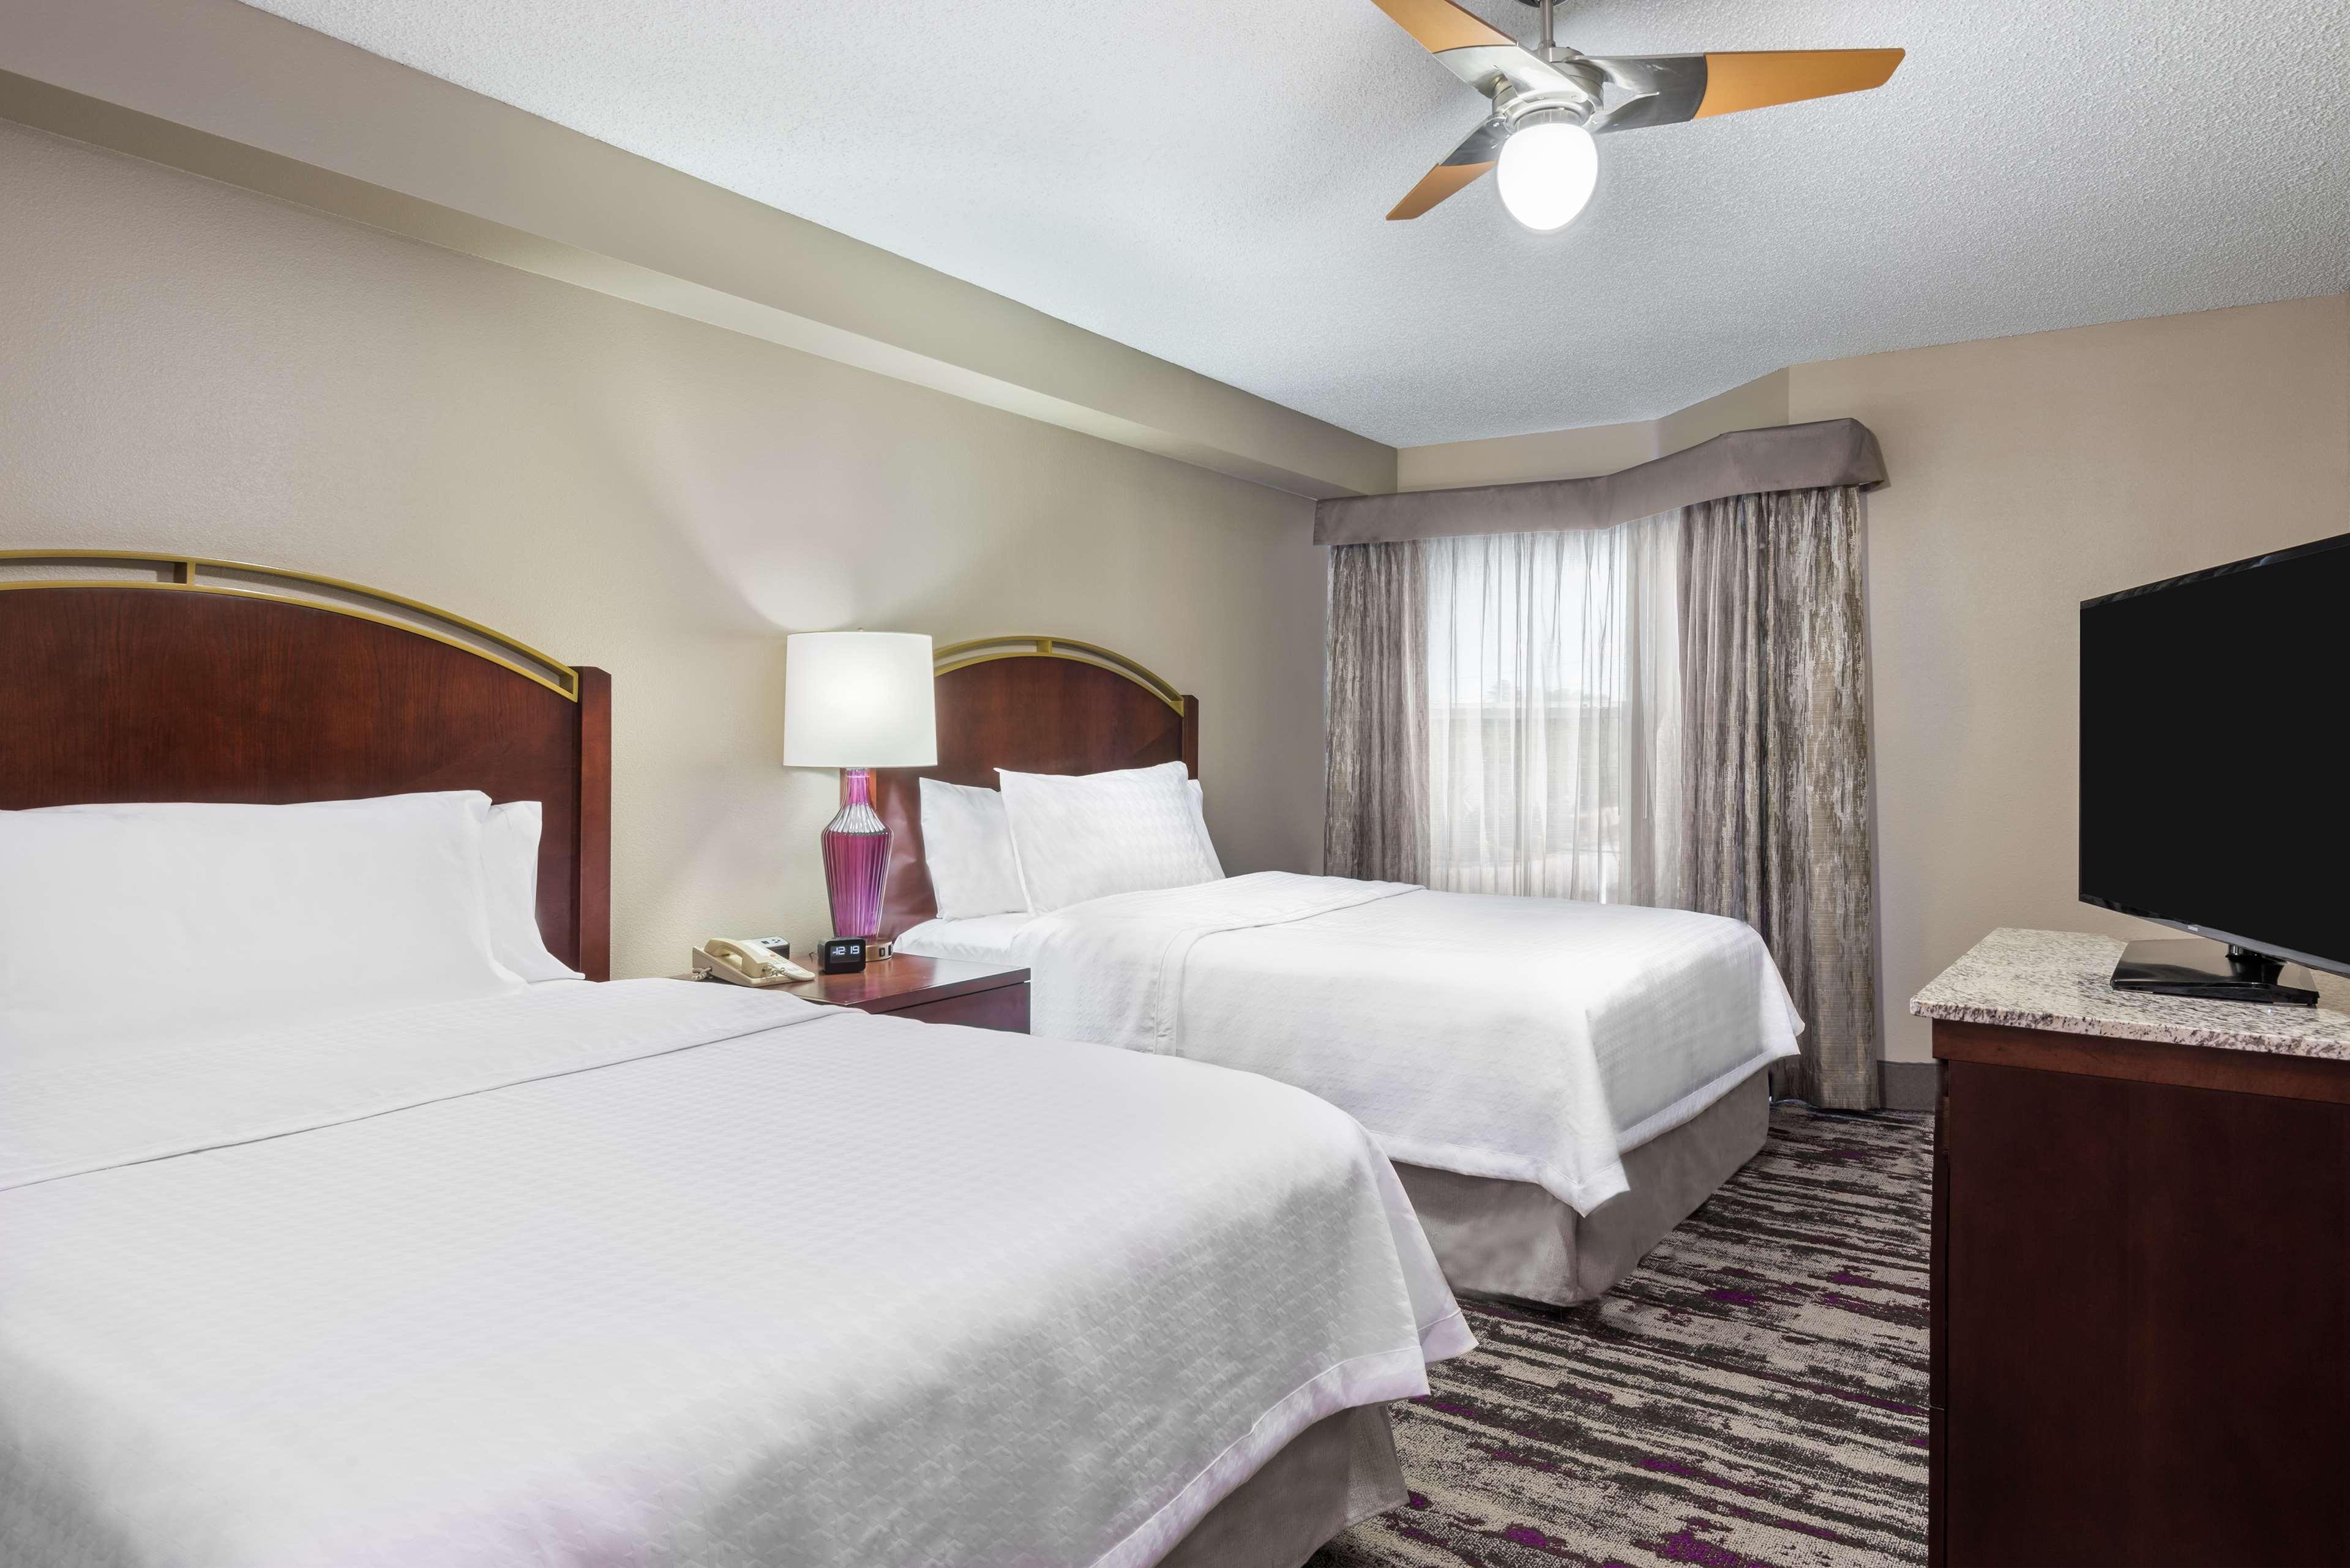 Homewood Suites by Hilton Orlando-UCF Area image 27